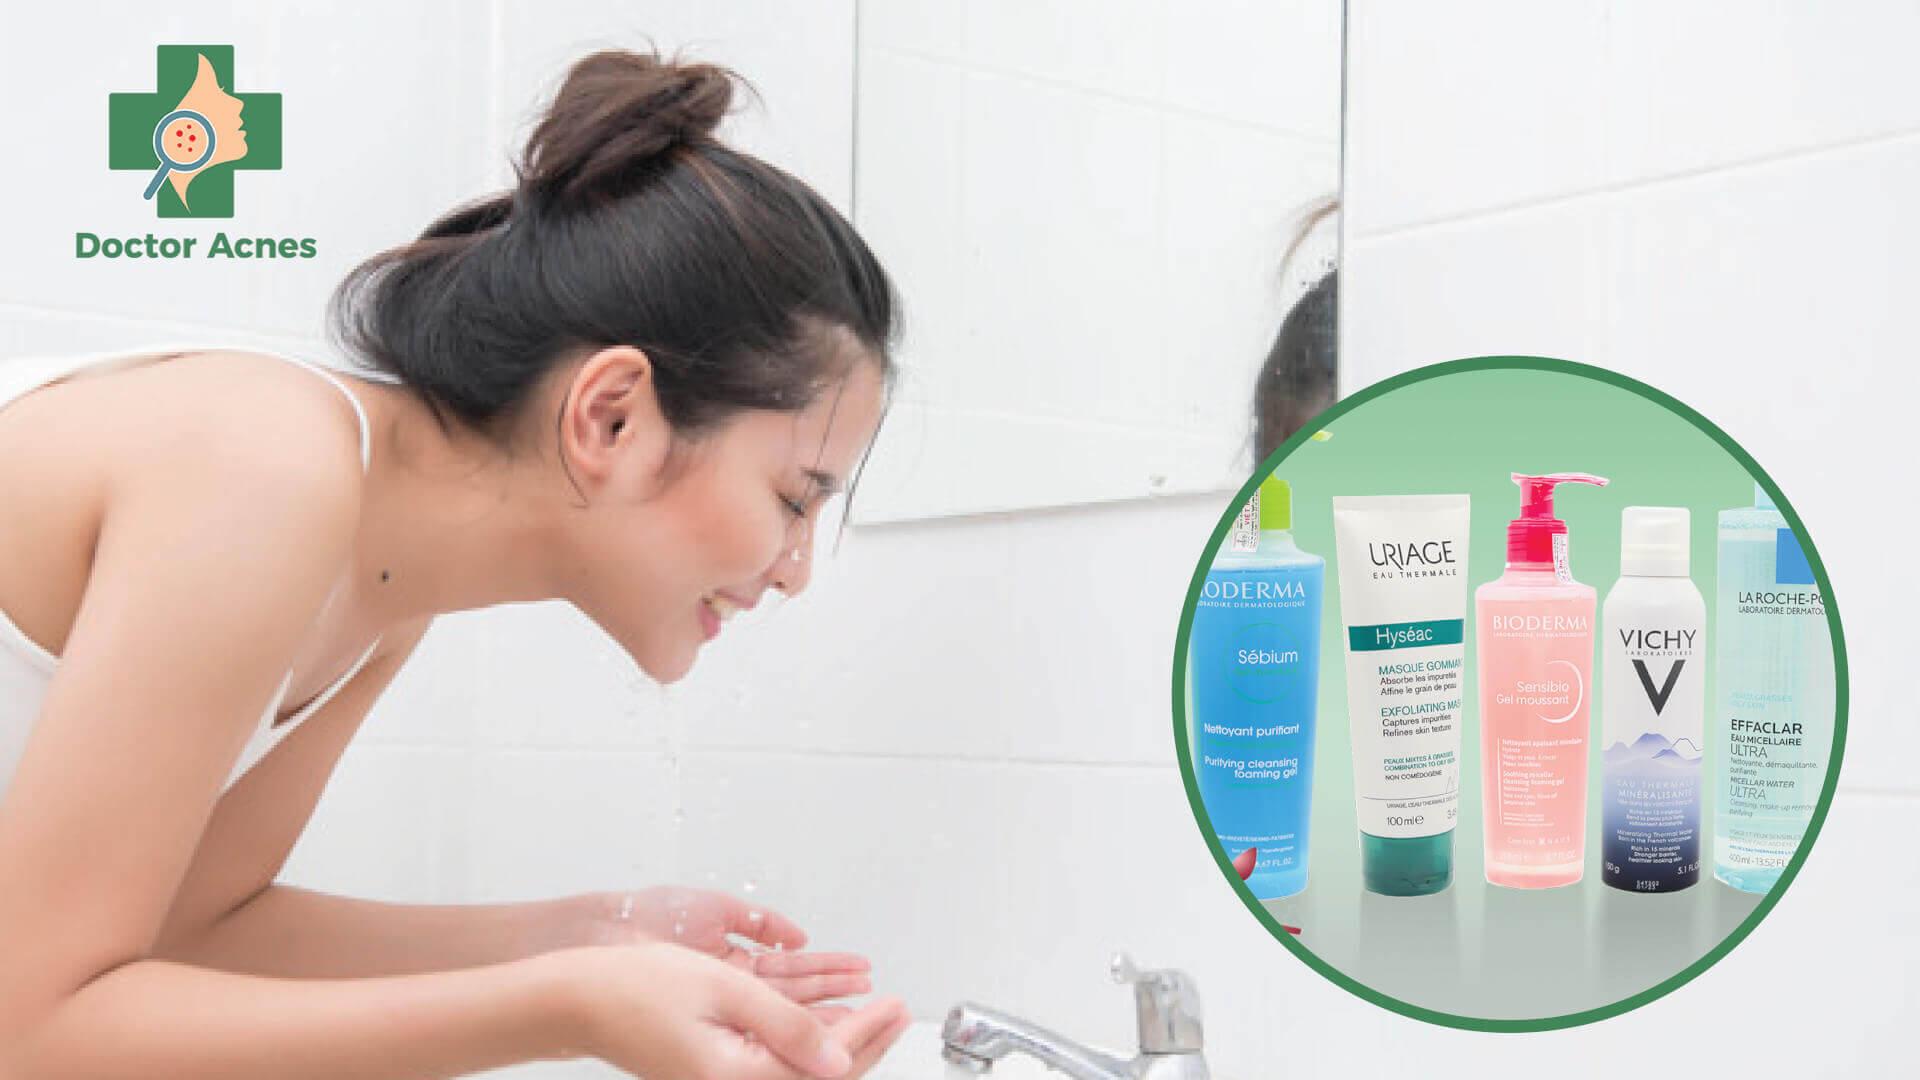 Nguyên tắc rửa mặt - Doctor Acnes